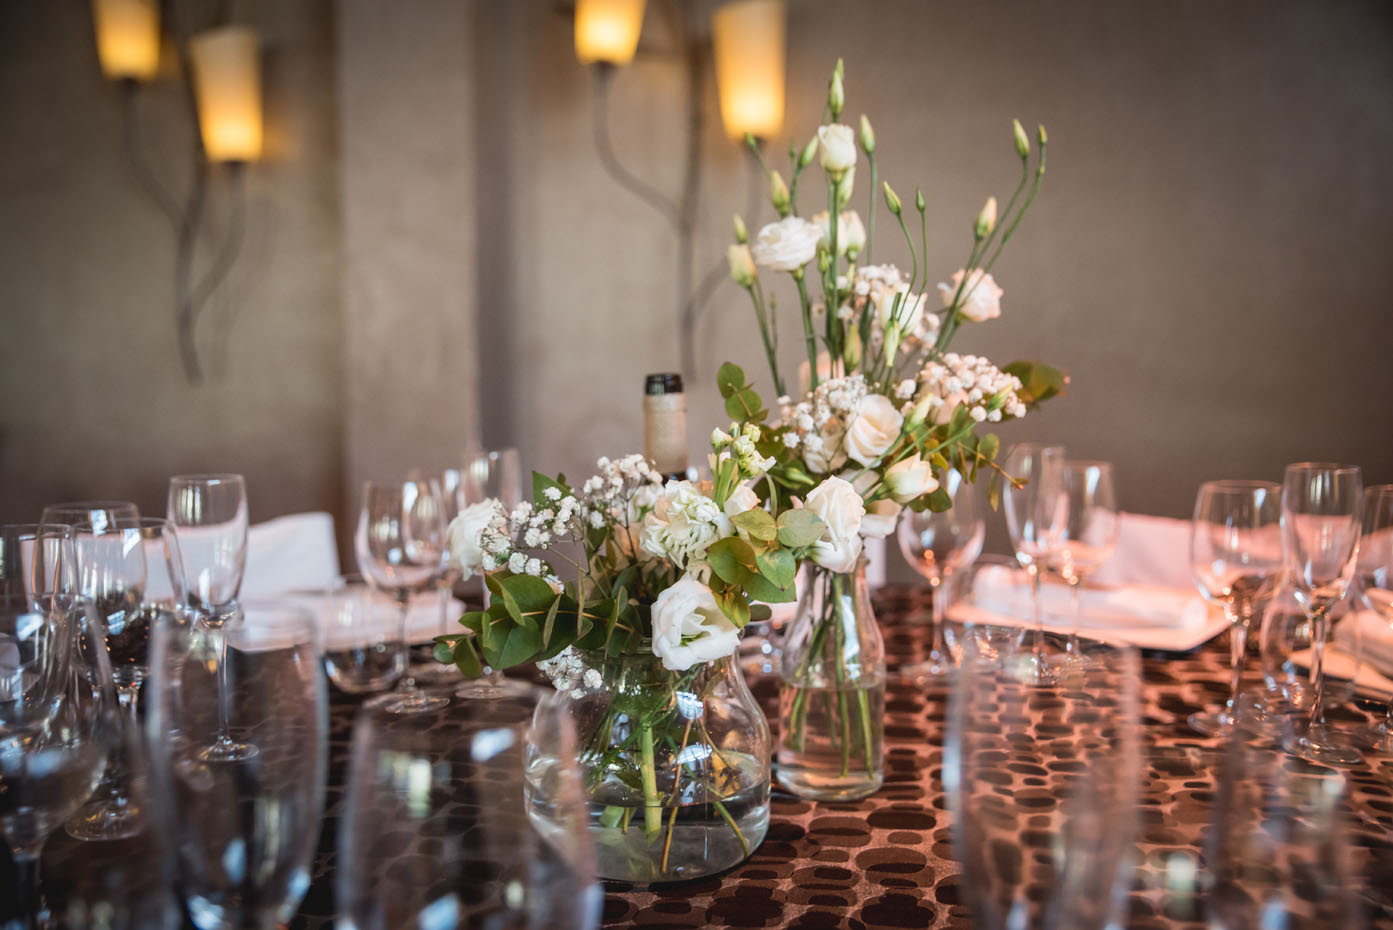 Casament-can-macia-espai-gastronomia29